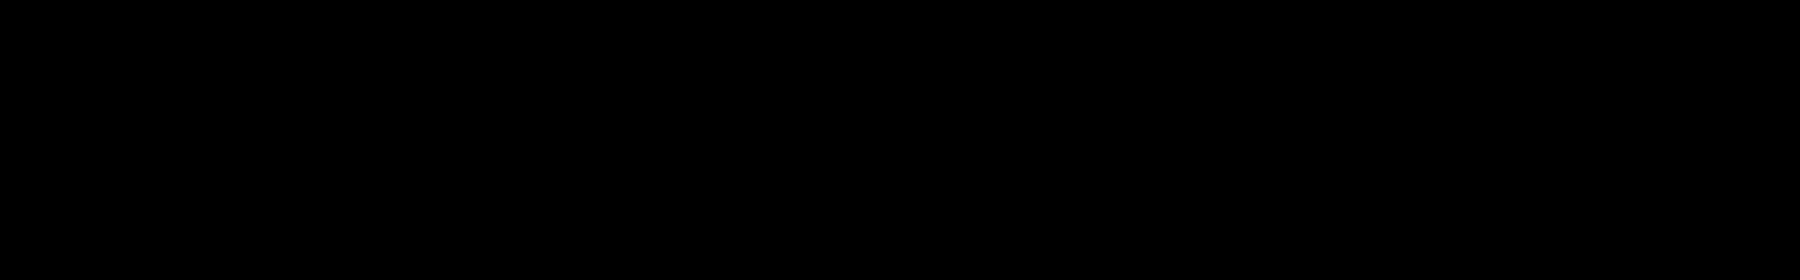 1984 audio waveform